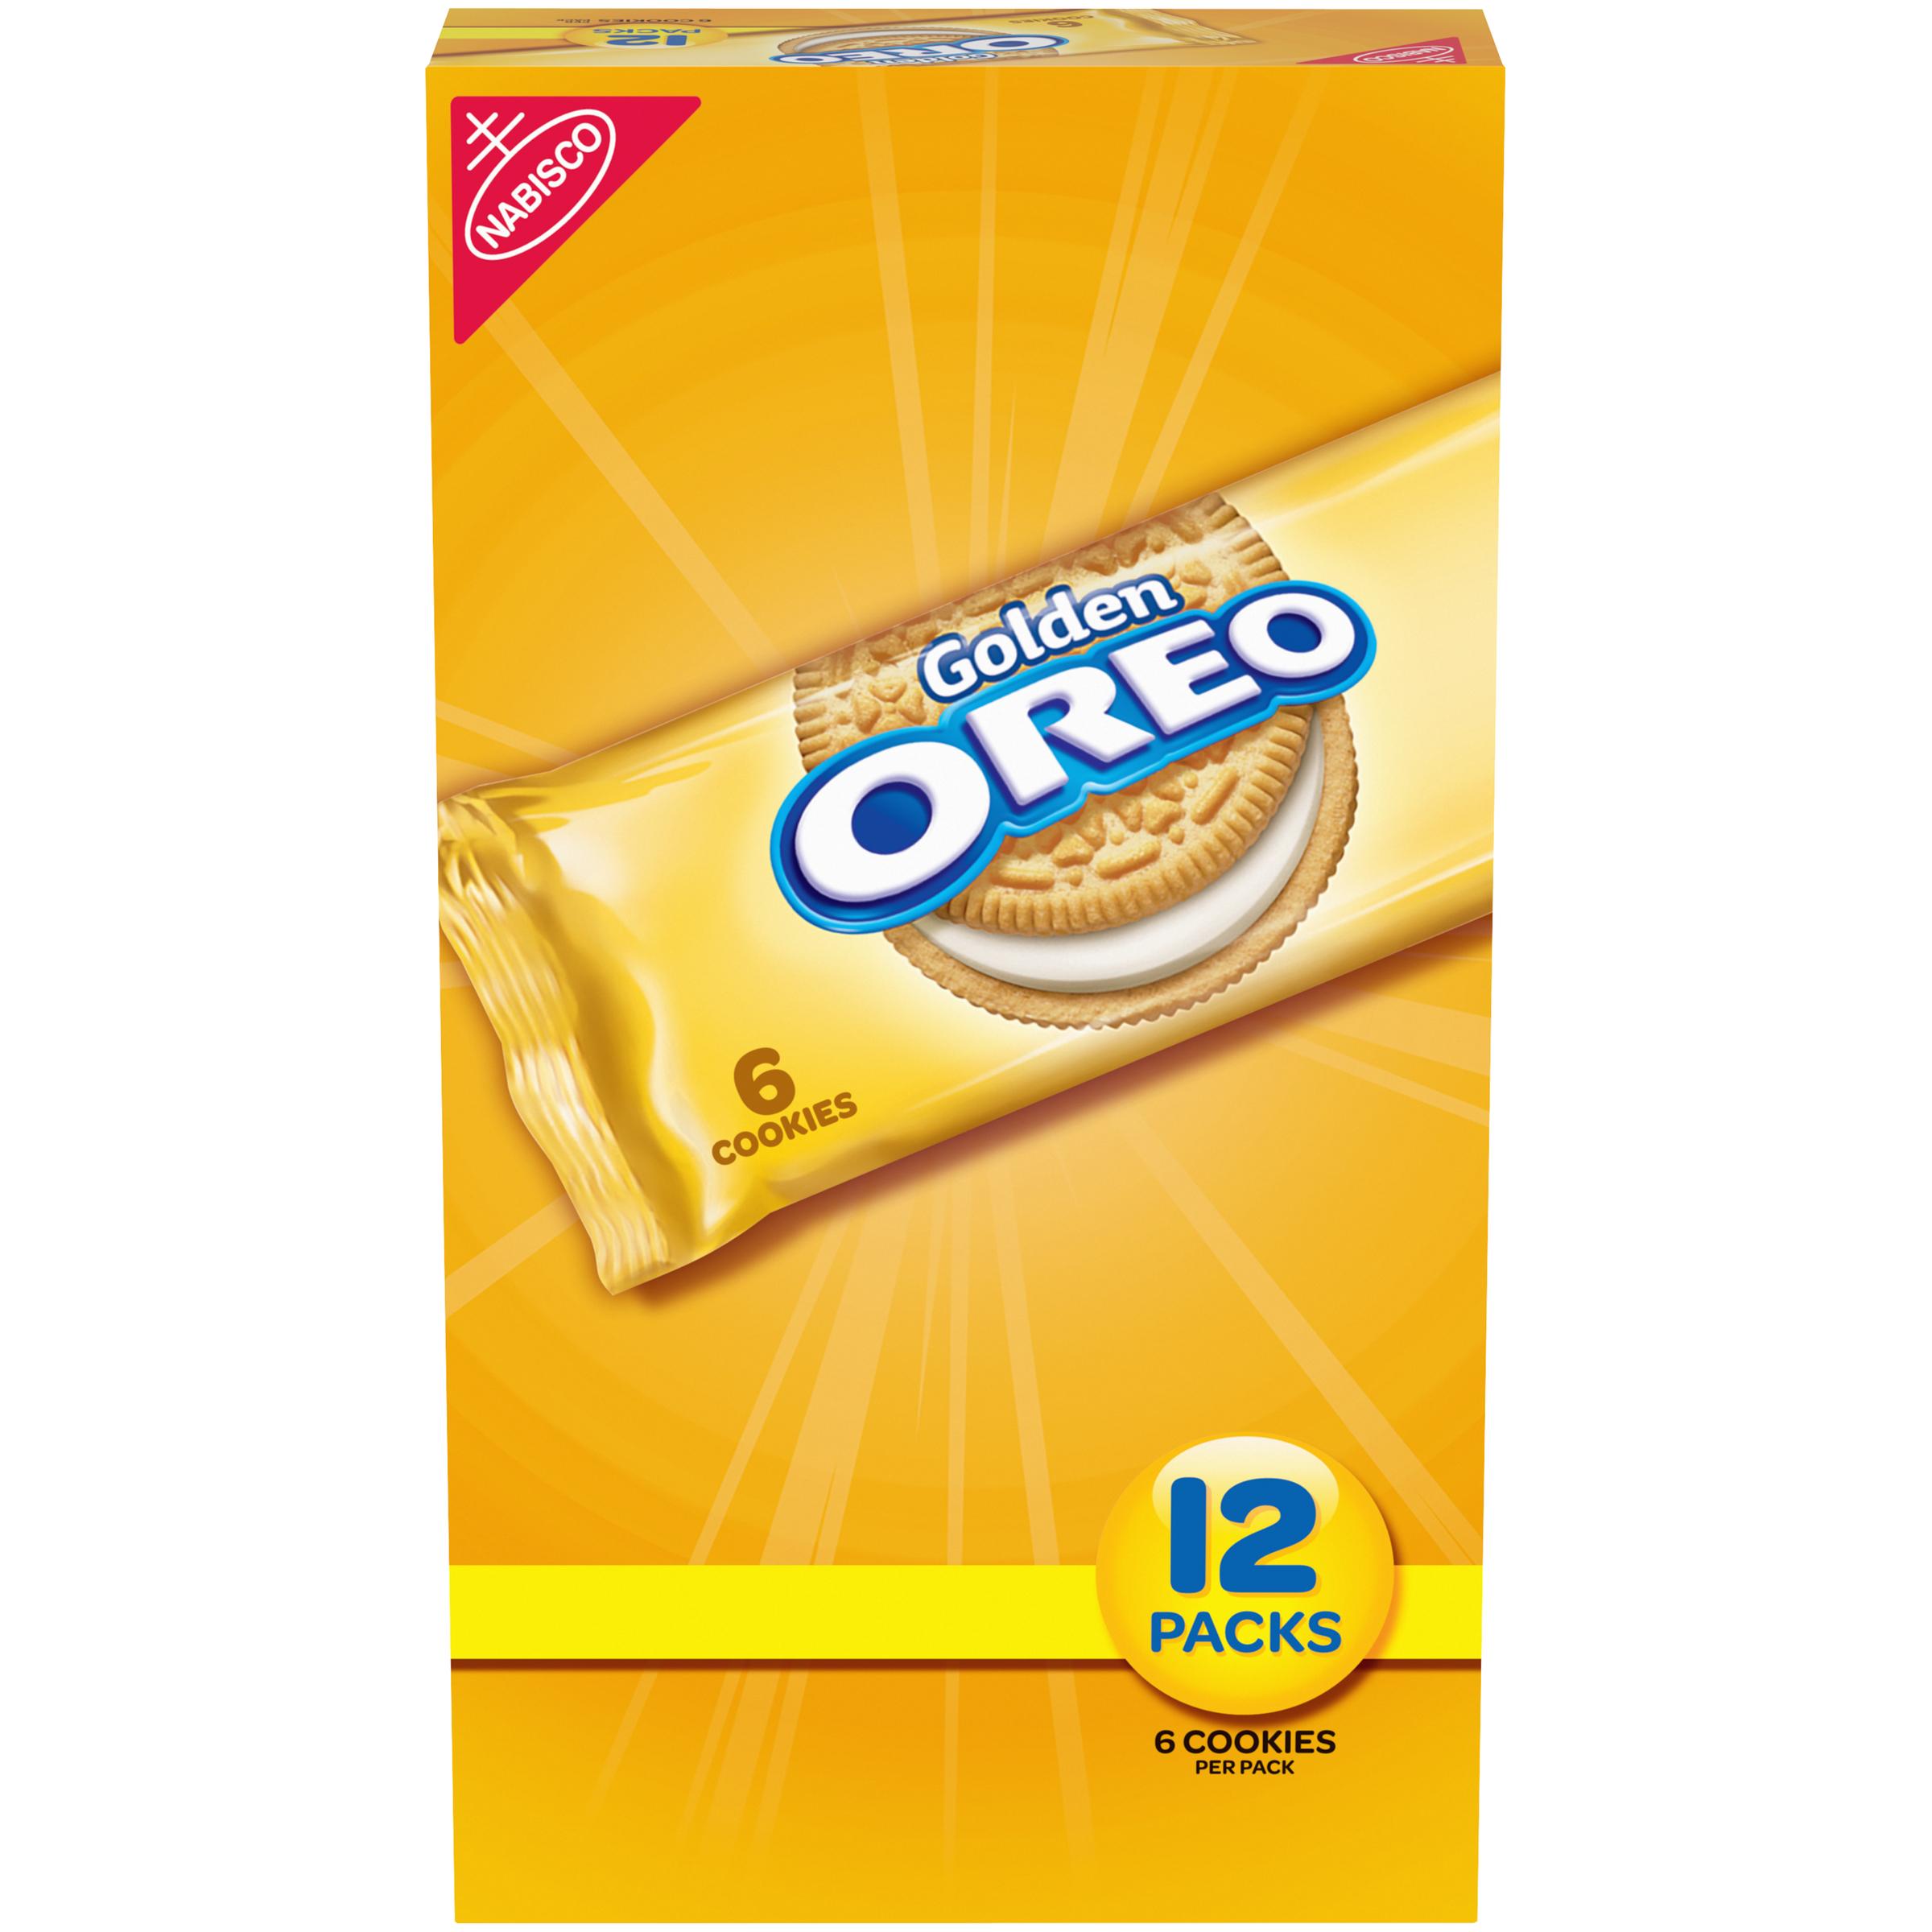 OREO Golden Oreo Cookies-Convenience Pack 28.8 oz